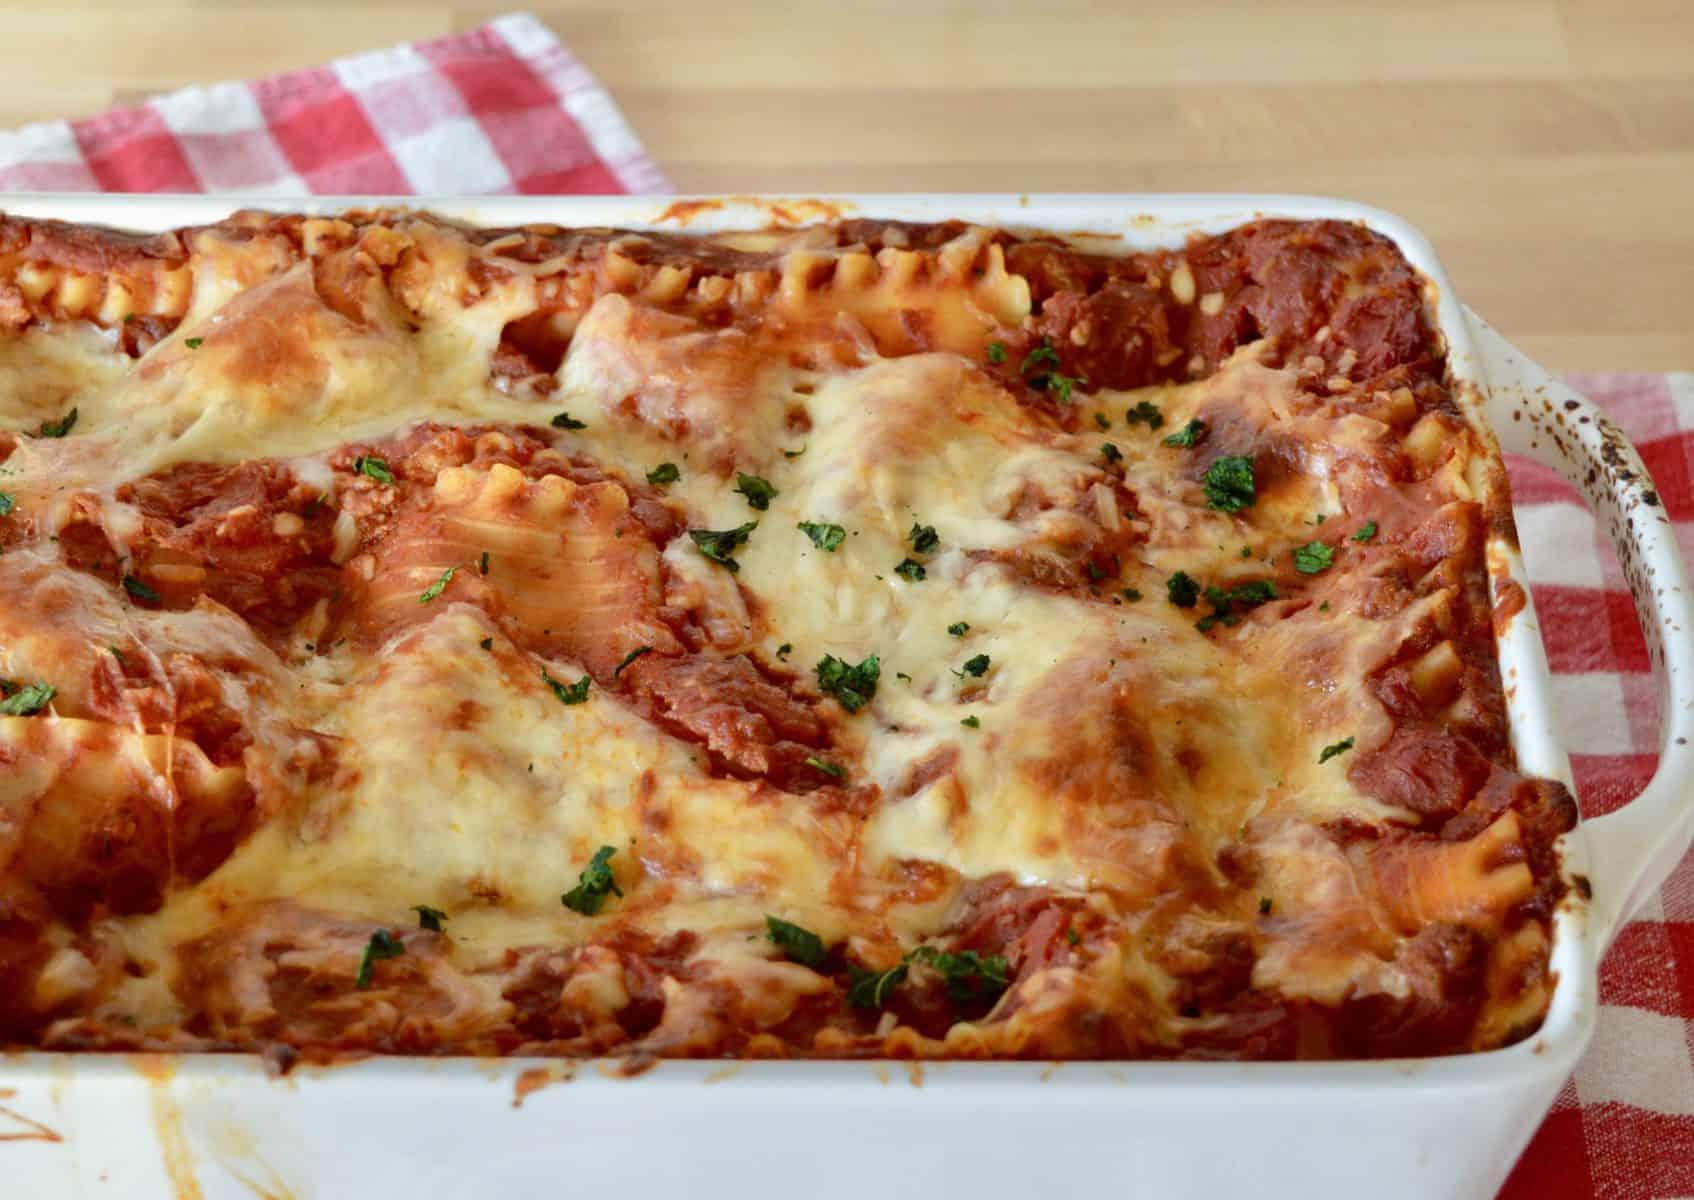 Italian Turkey Lasagne in a white baking dish.